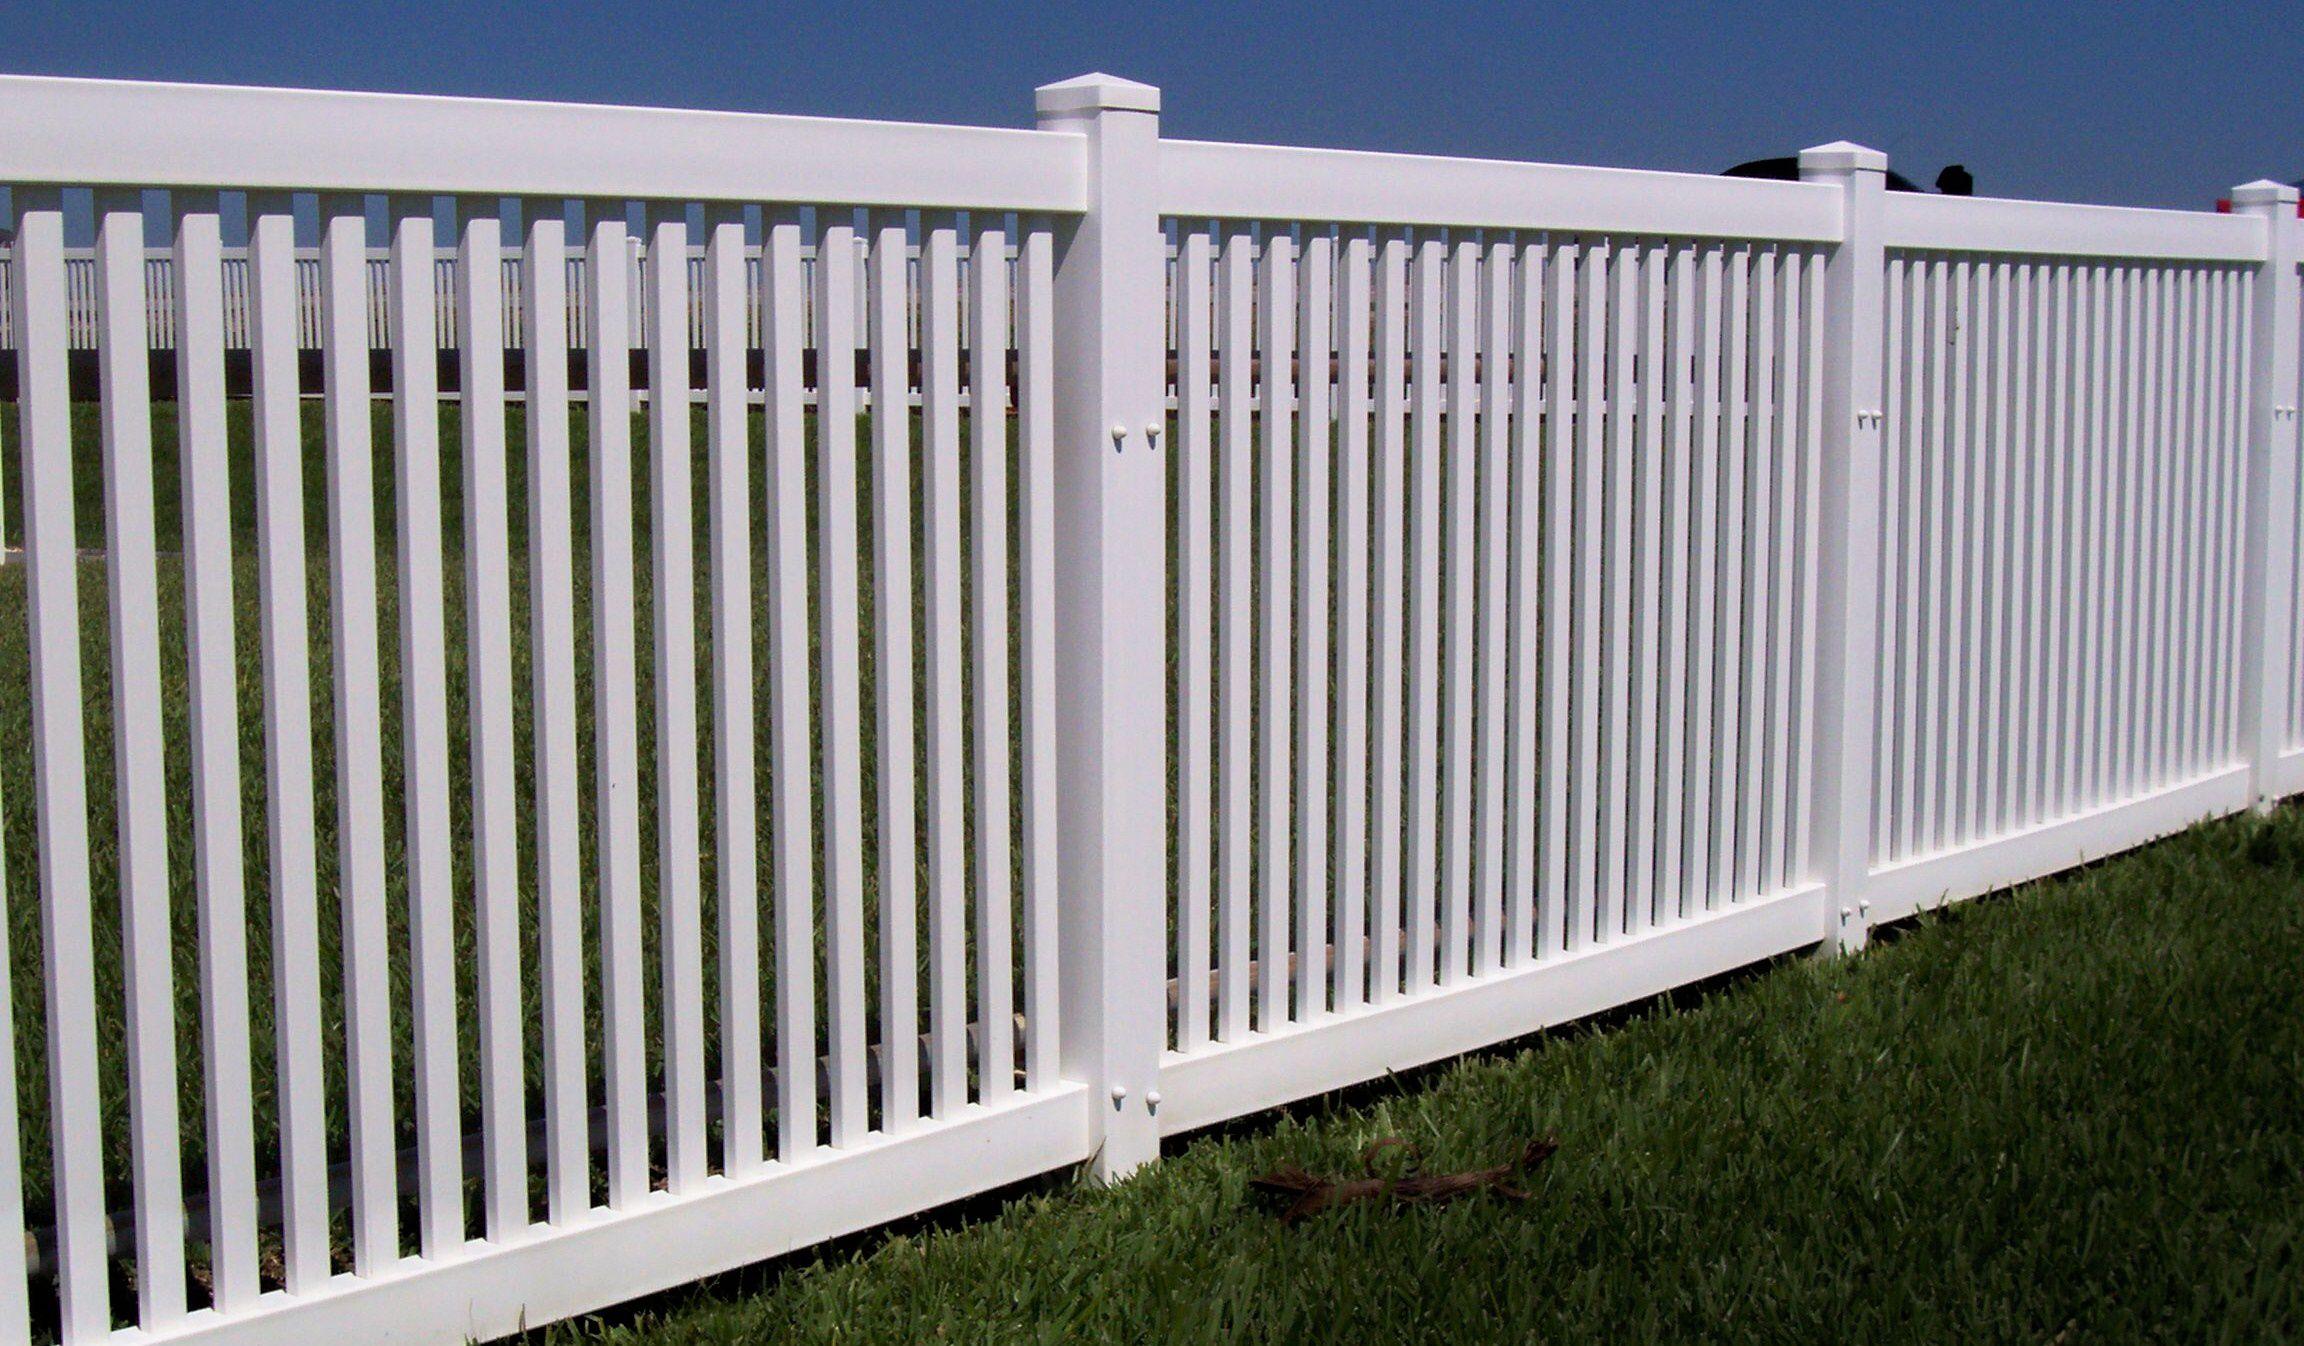 Large Vinyl Fence Panels Jpg 2304 1346 Front Yard Fence Cheap Fence Backyard Fences